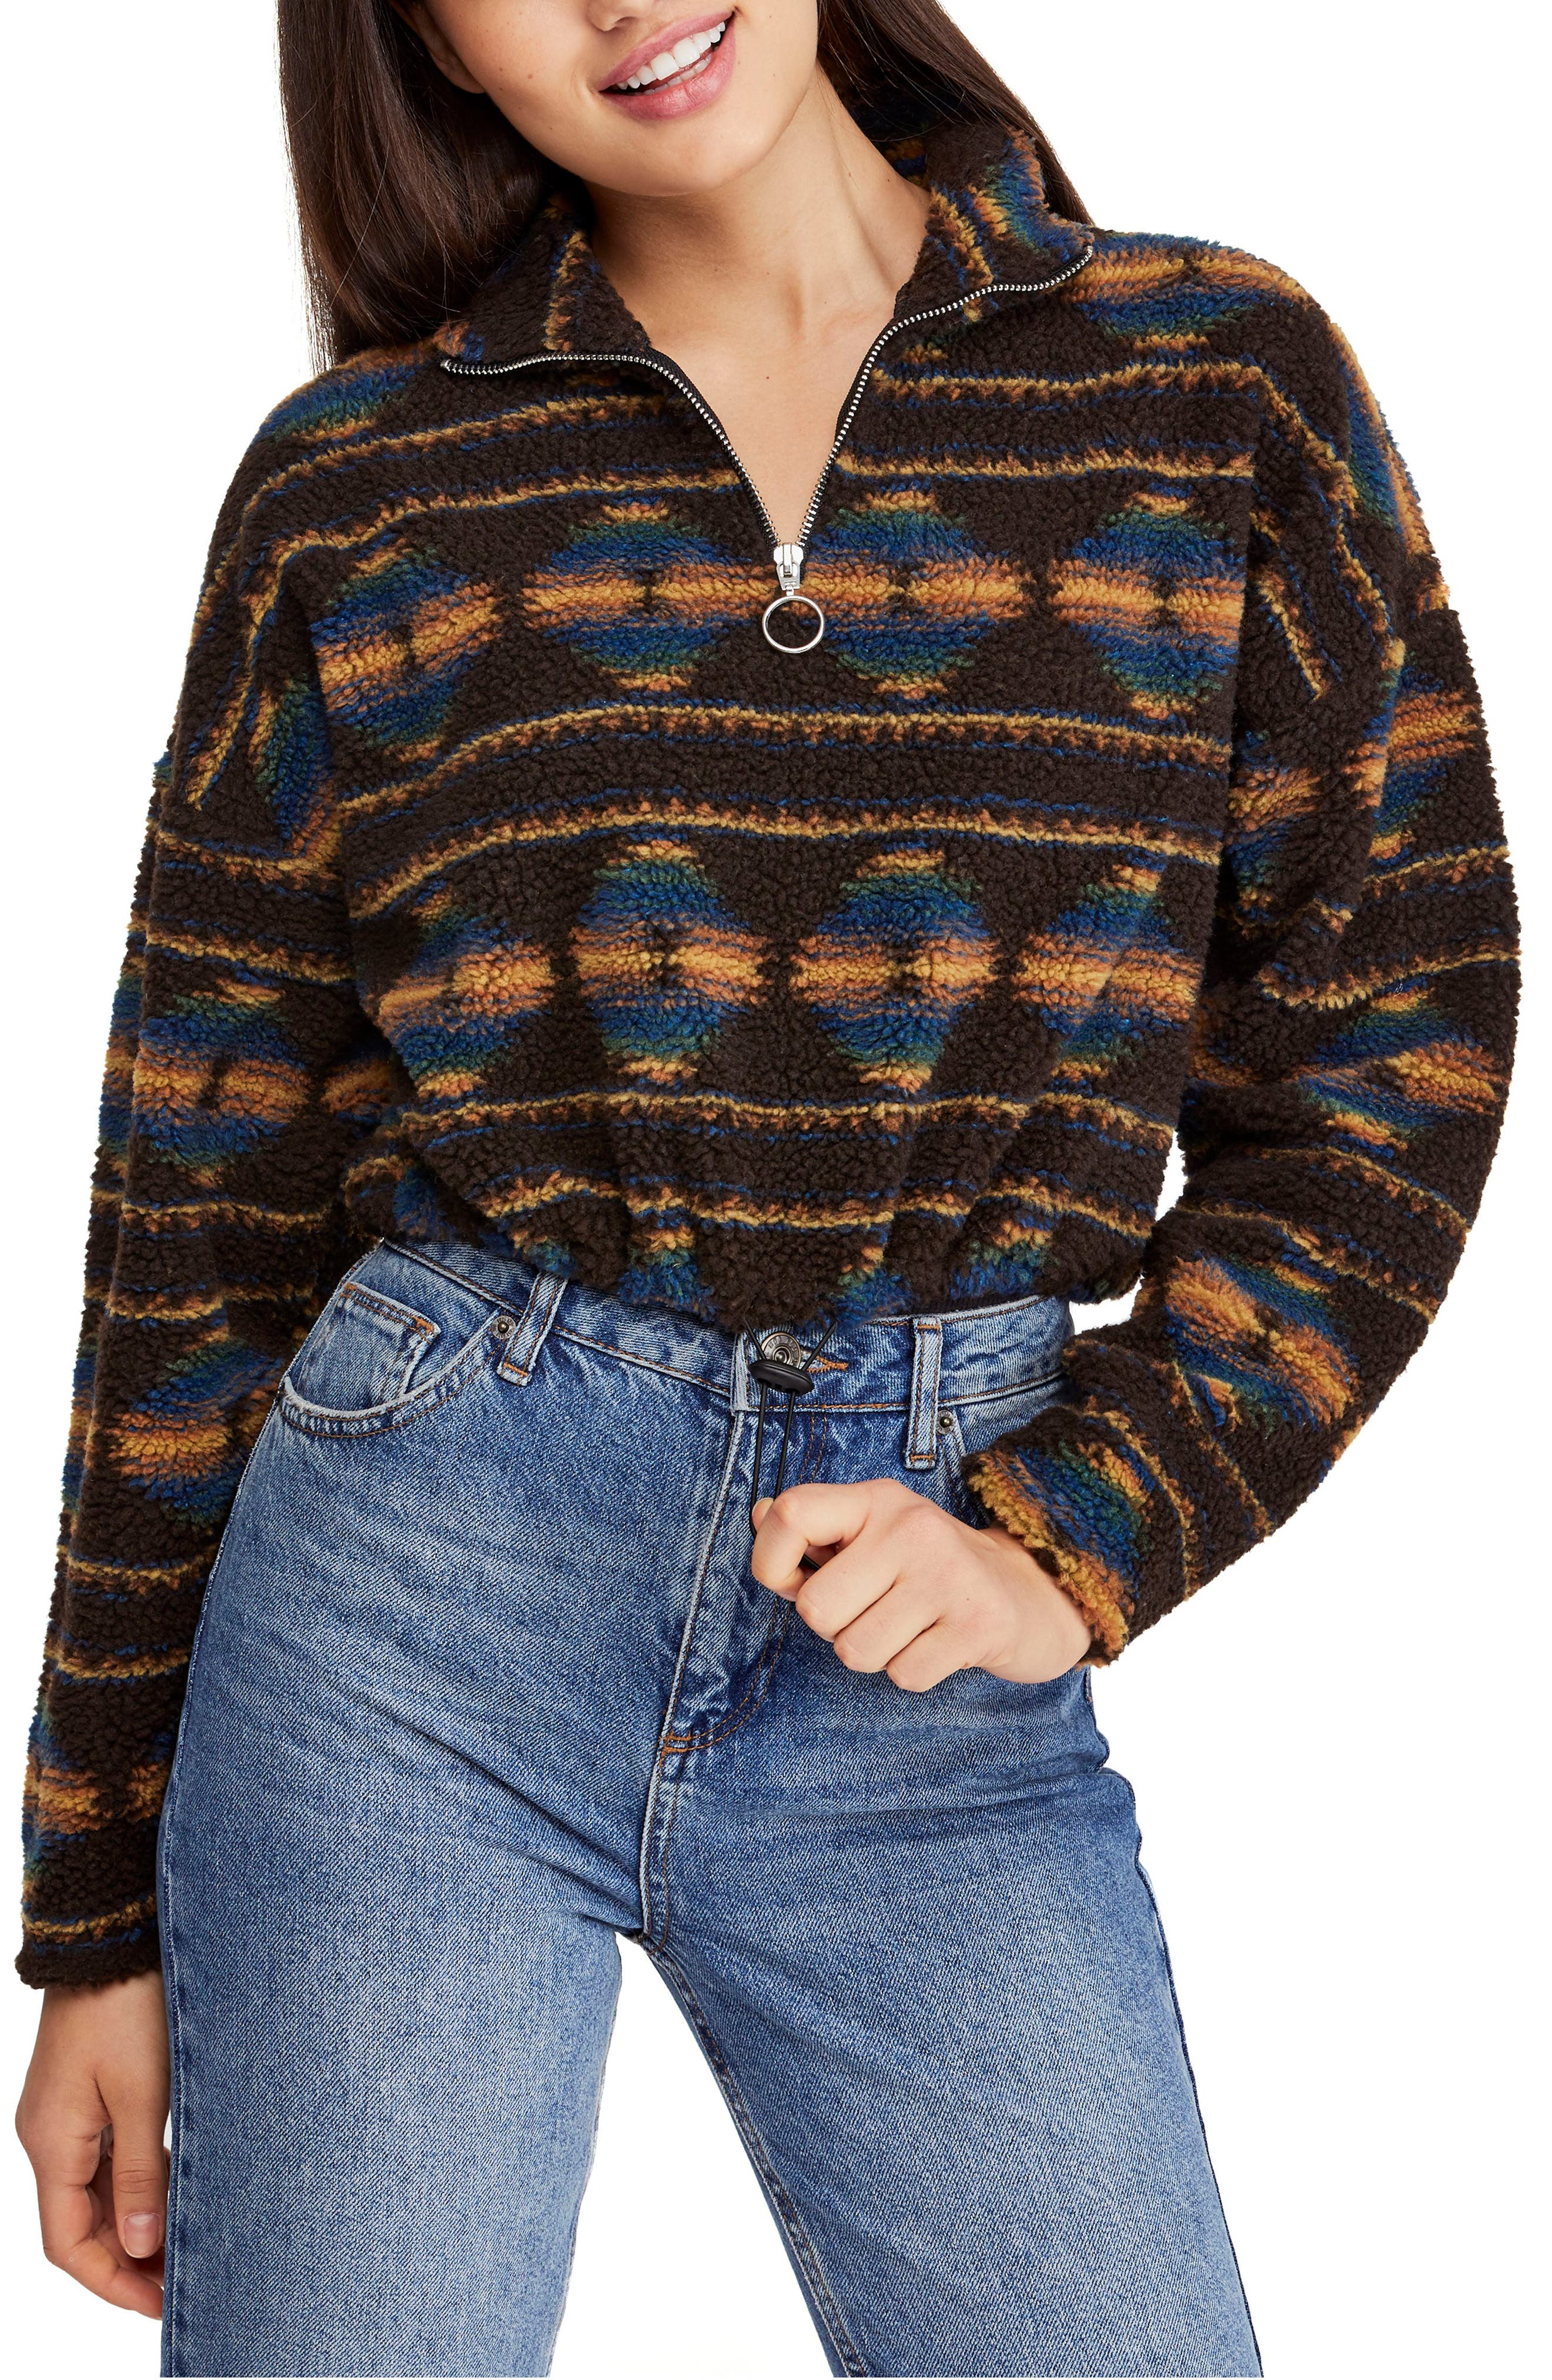 Bdg Urban Outfitters Southwestern Fleece Jacket, Brown